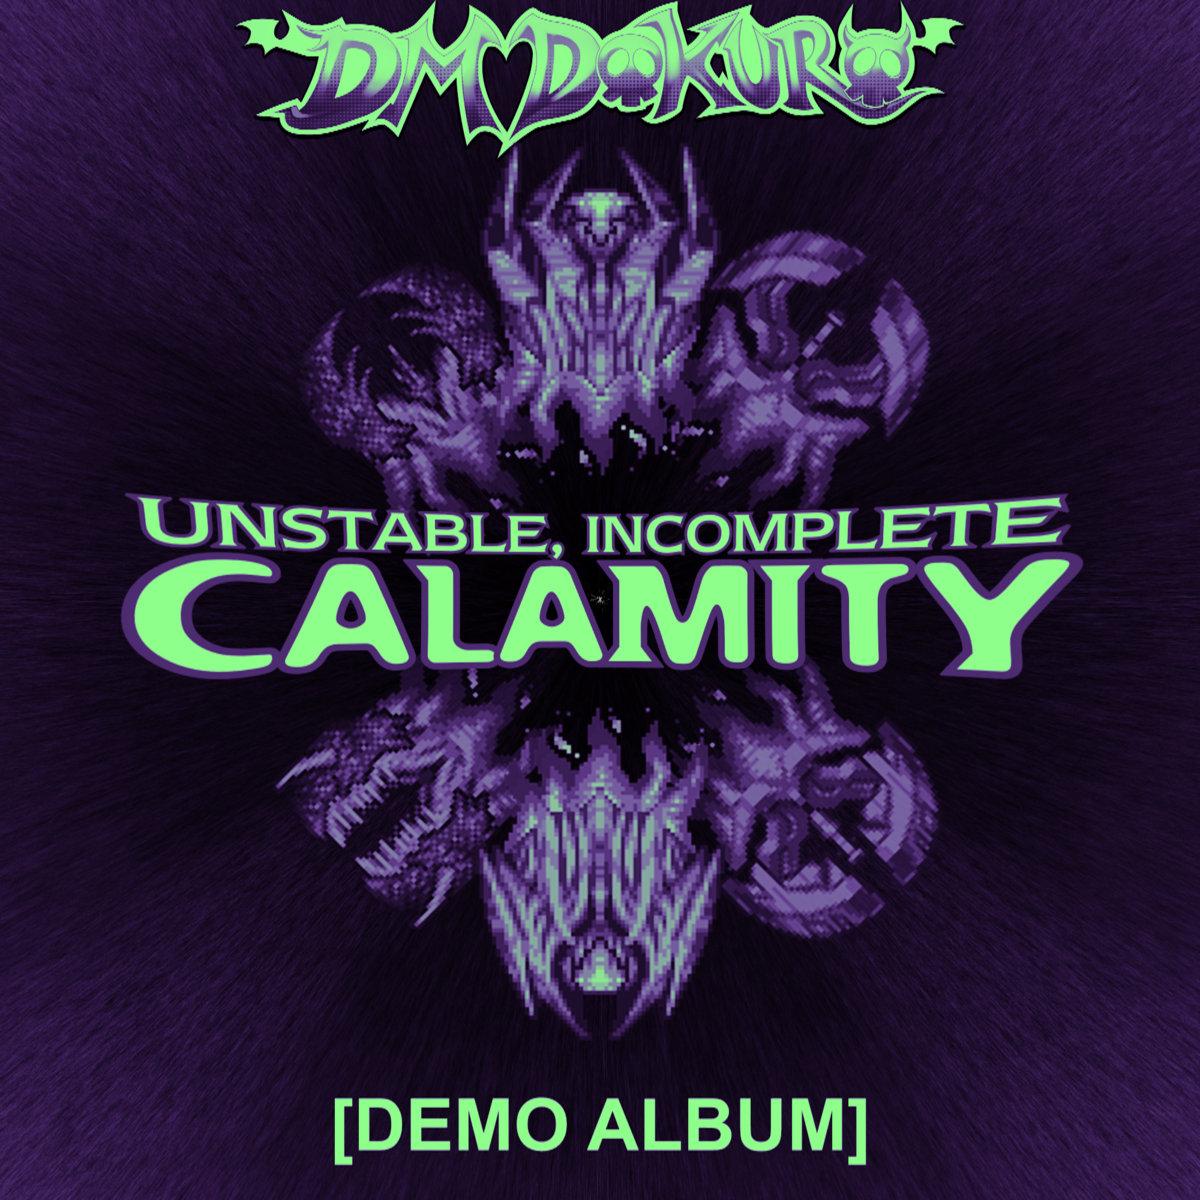 Unstable, Incomplete CALAMITY | DM DOKURO